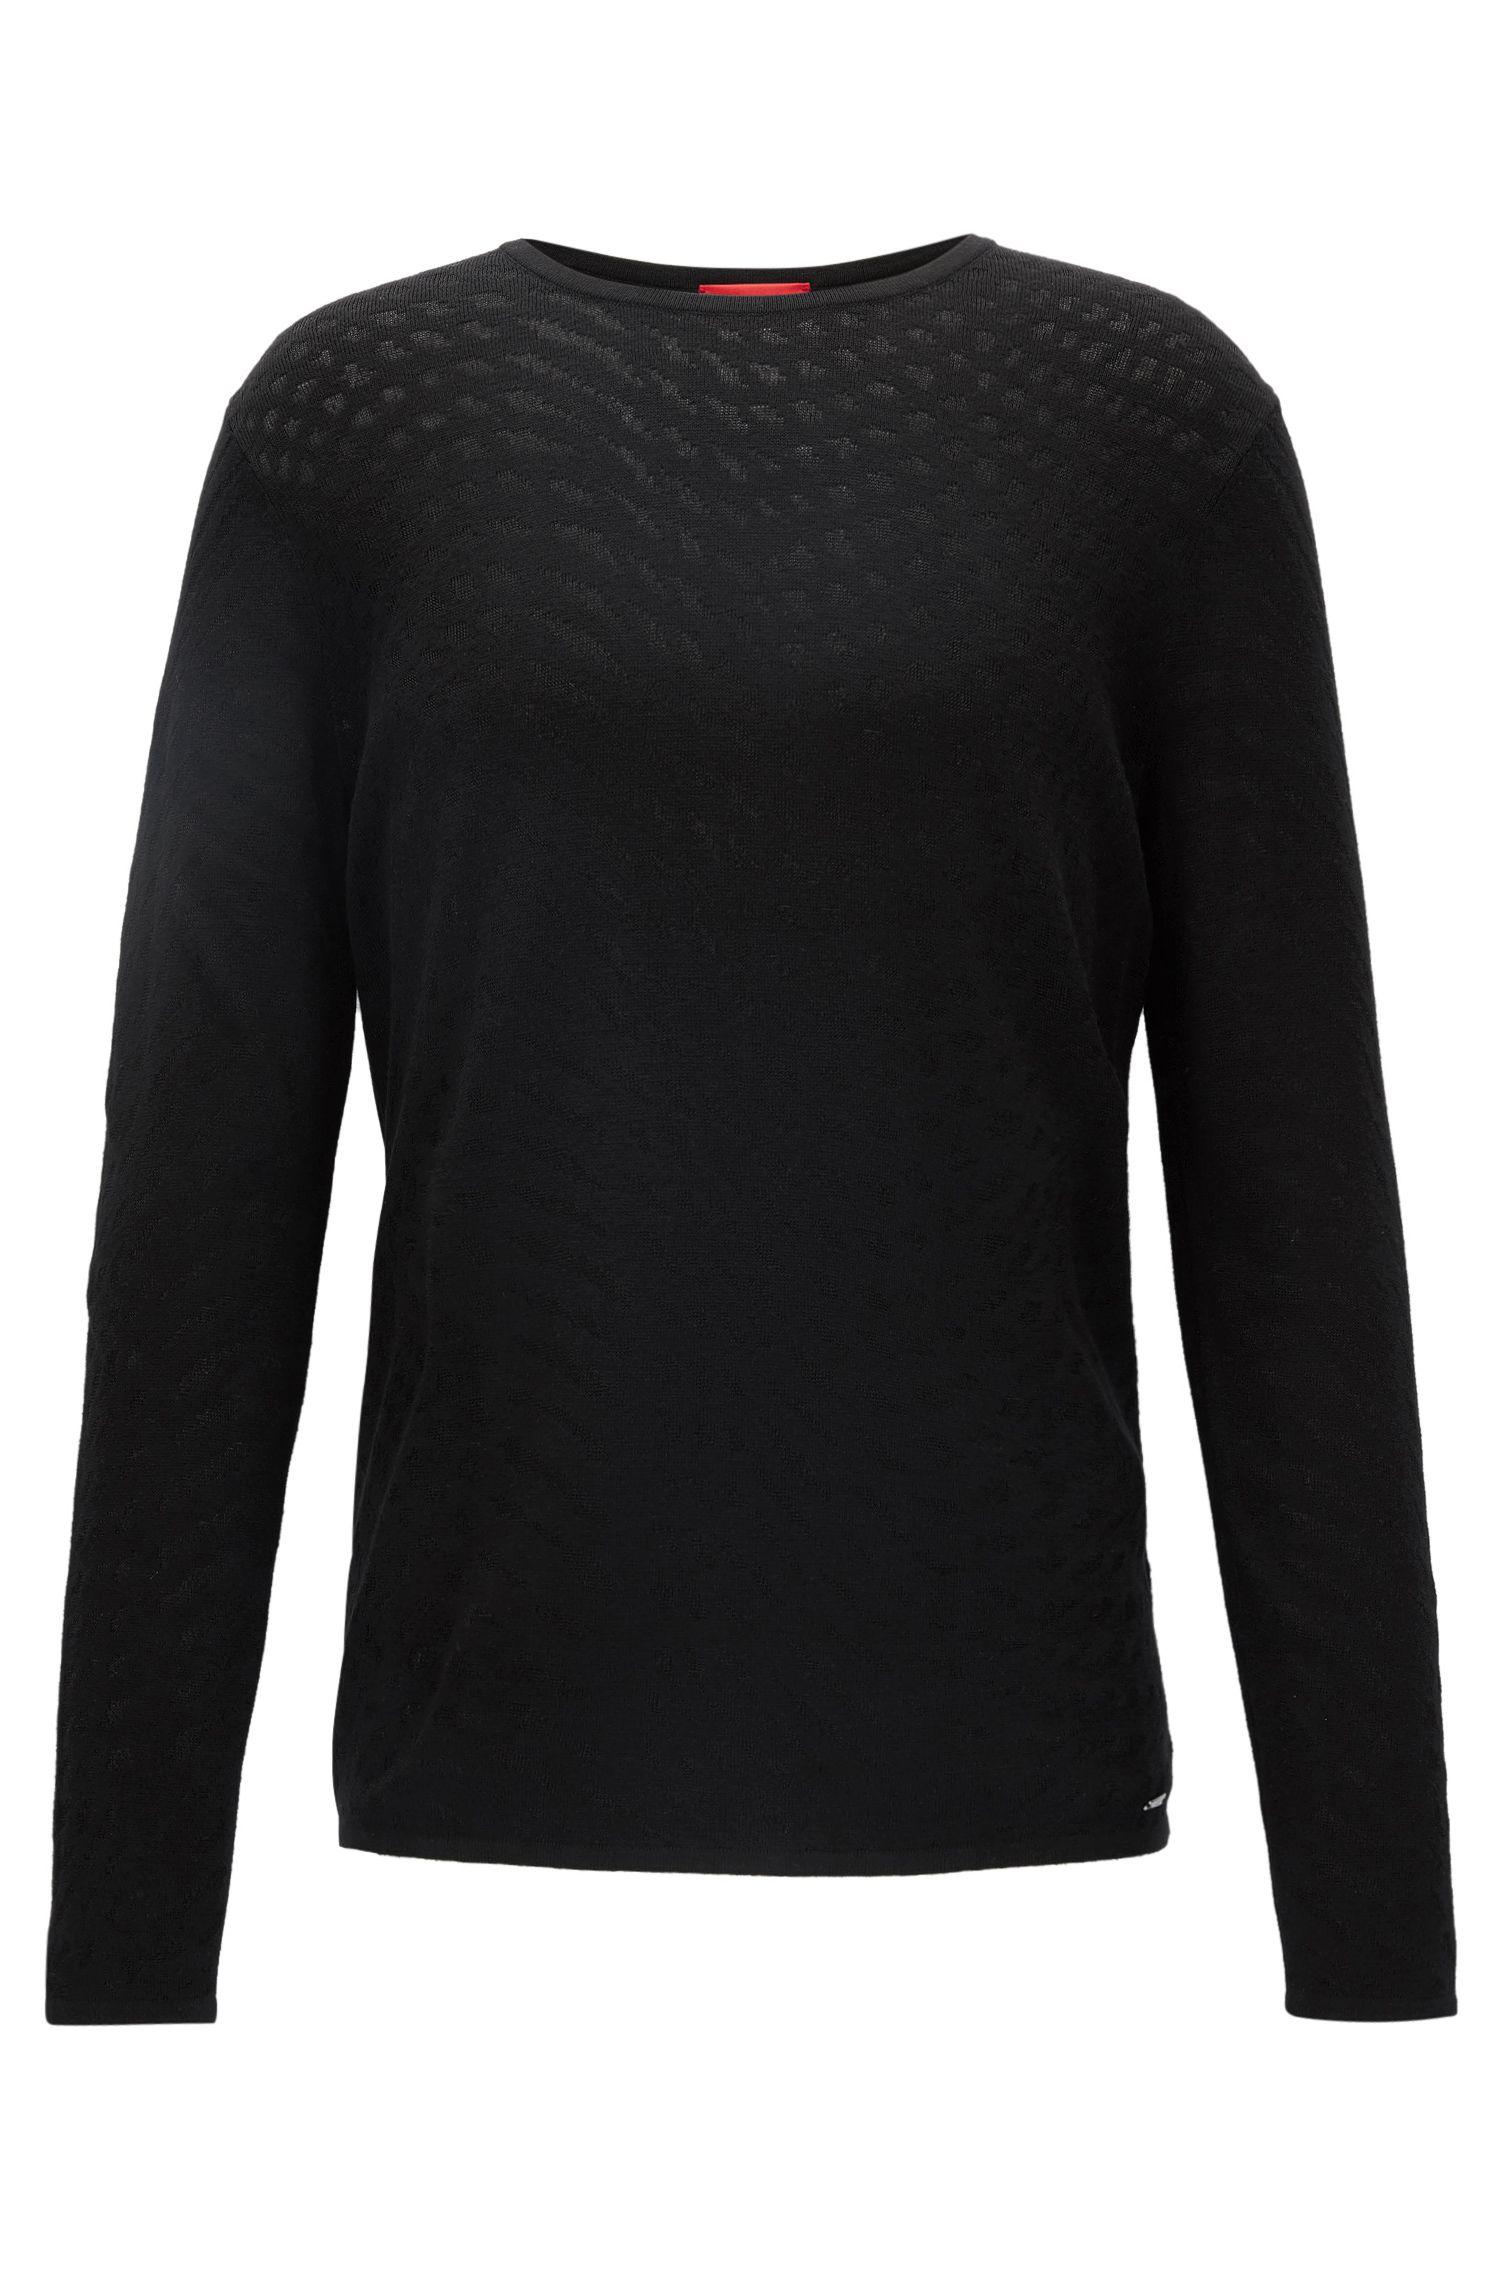 Rorschach Jacquard Sweater | Sull